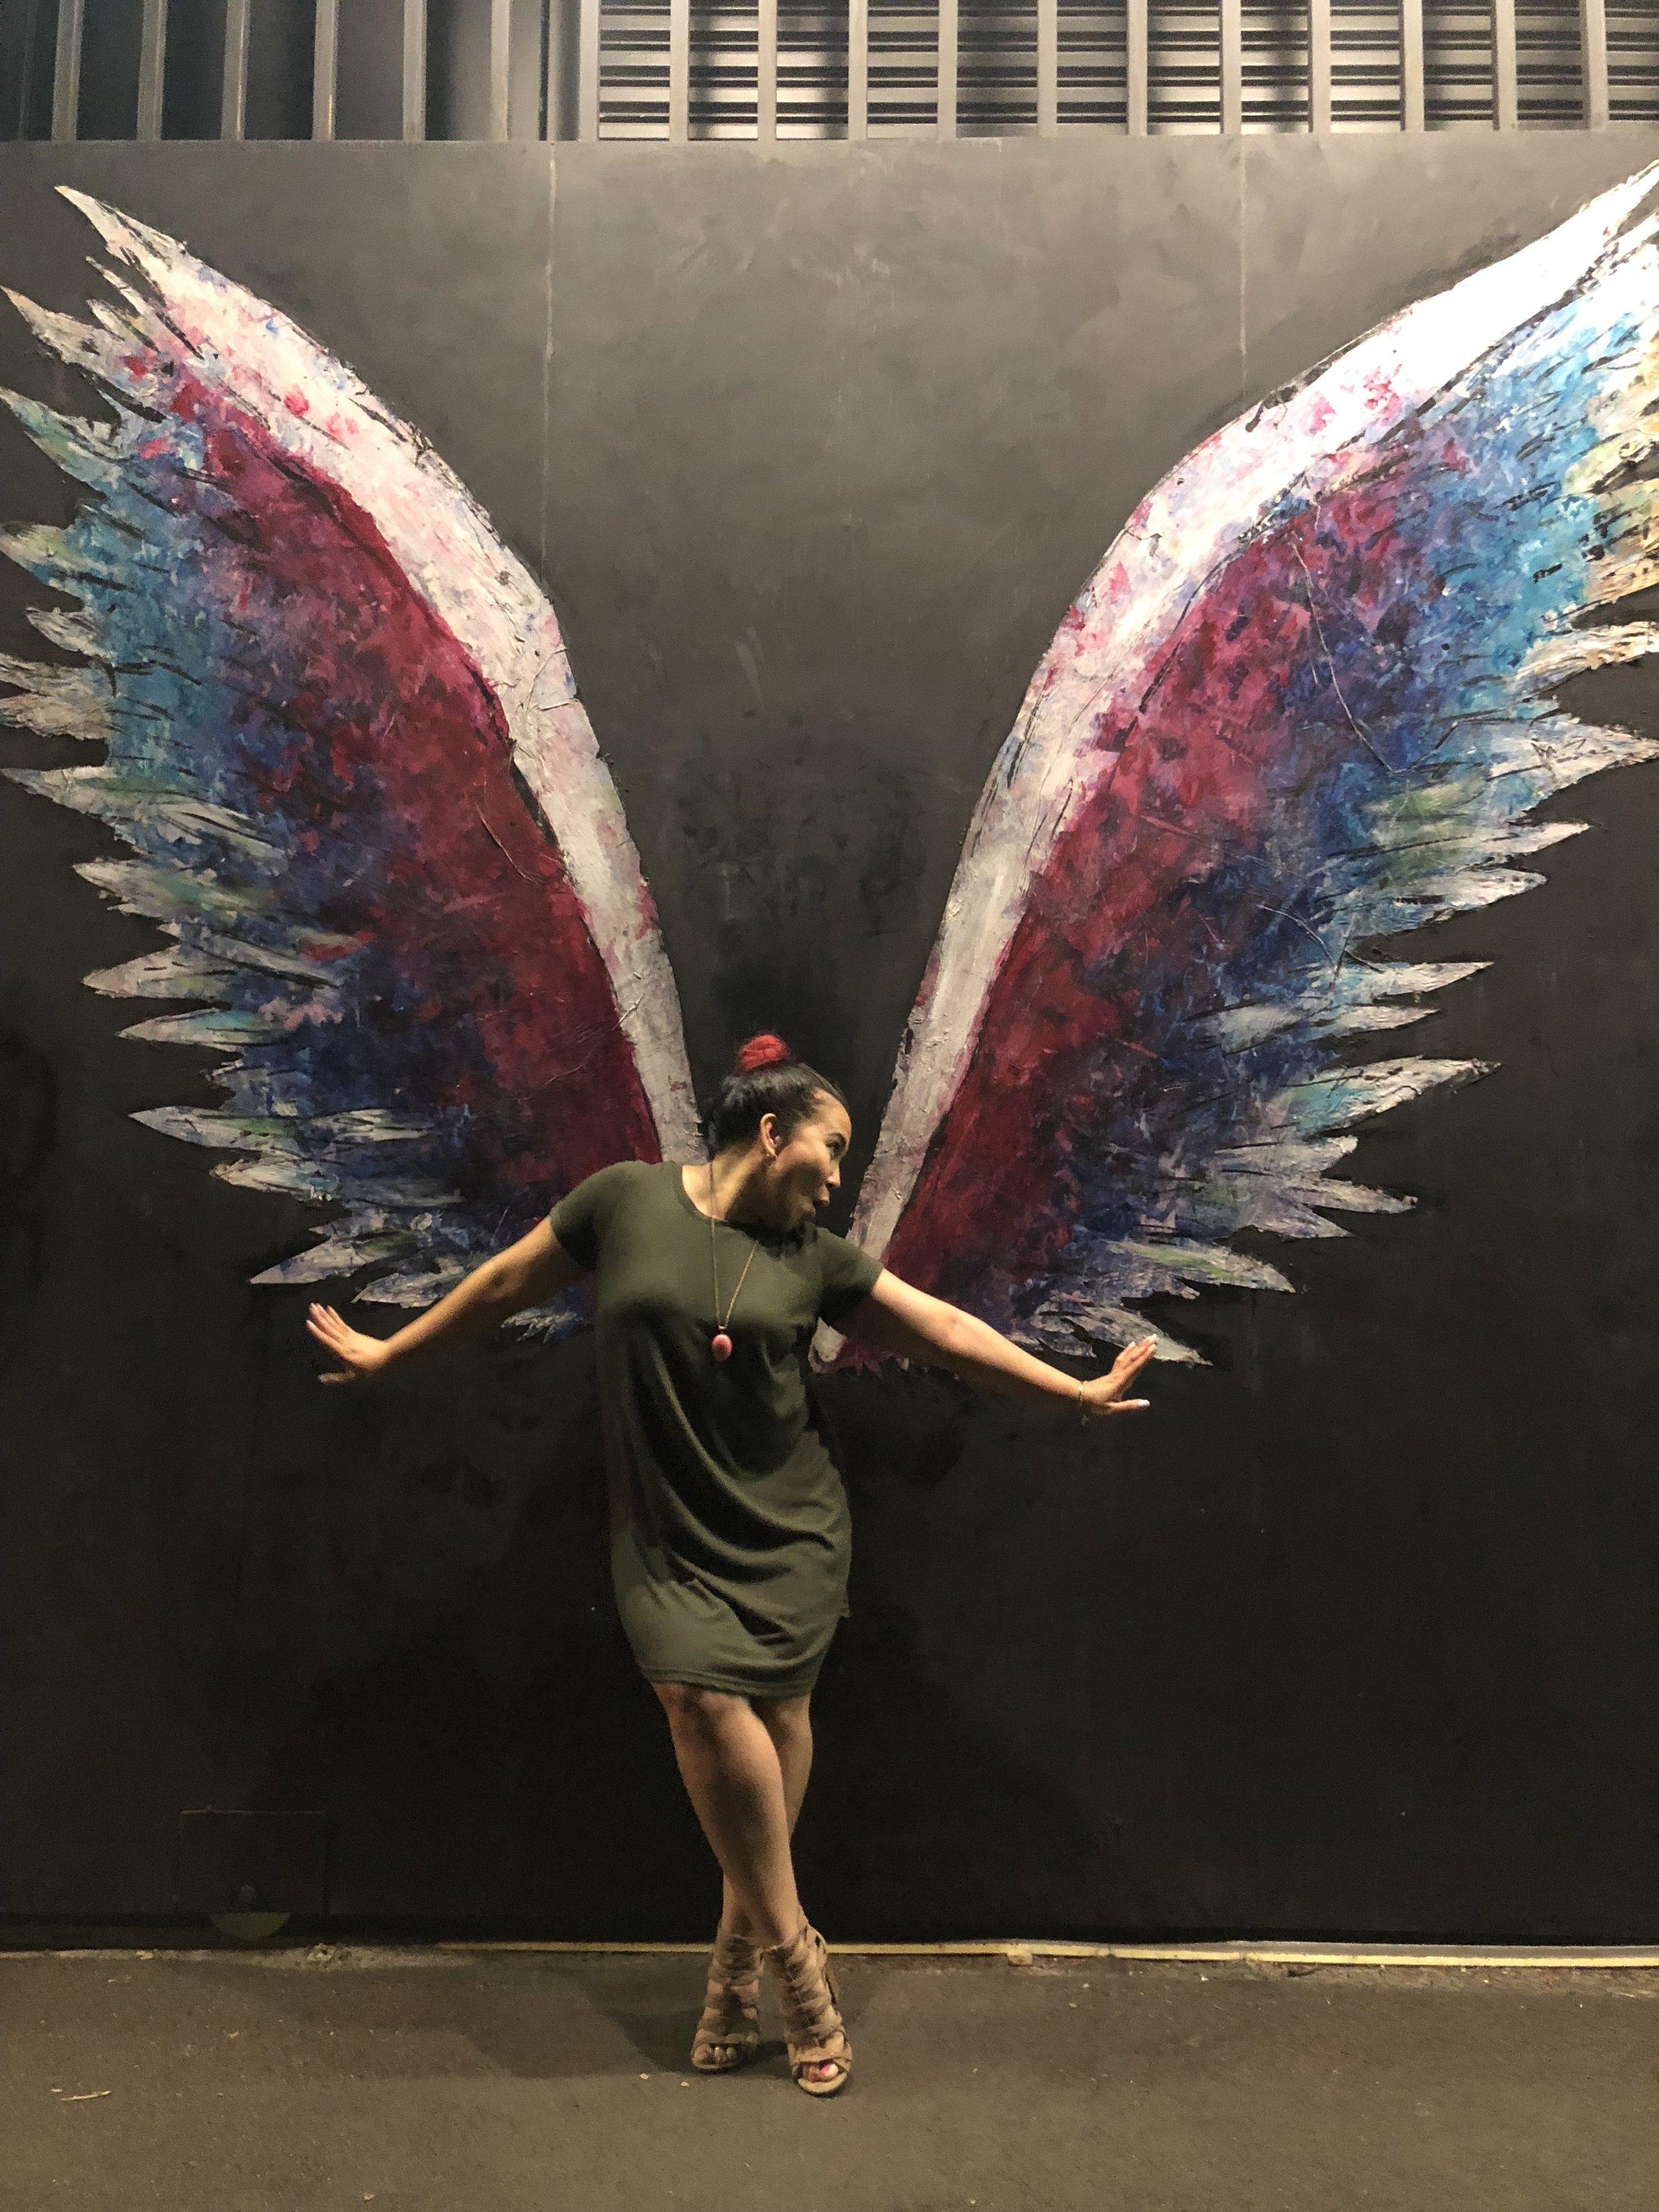 Angel Wings DTLA Aug 2018.JPG